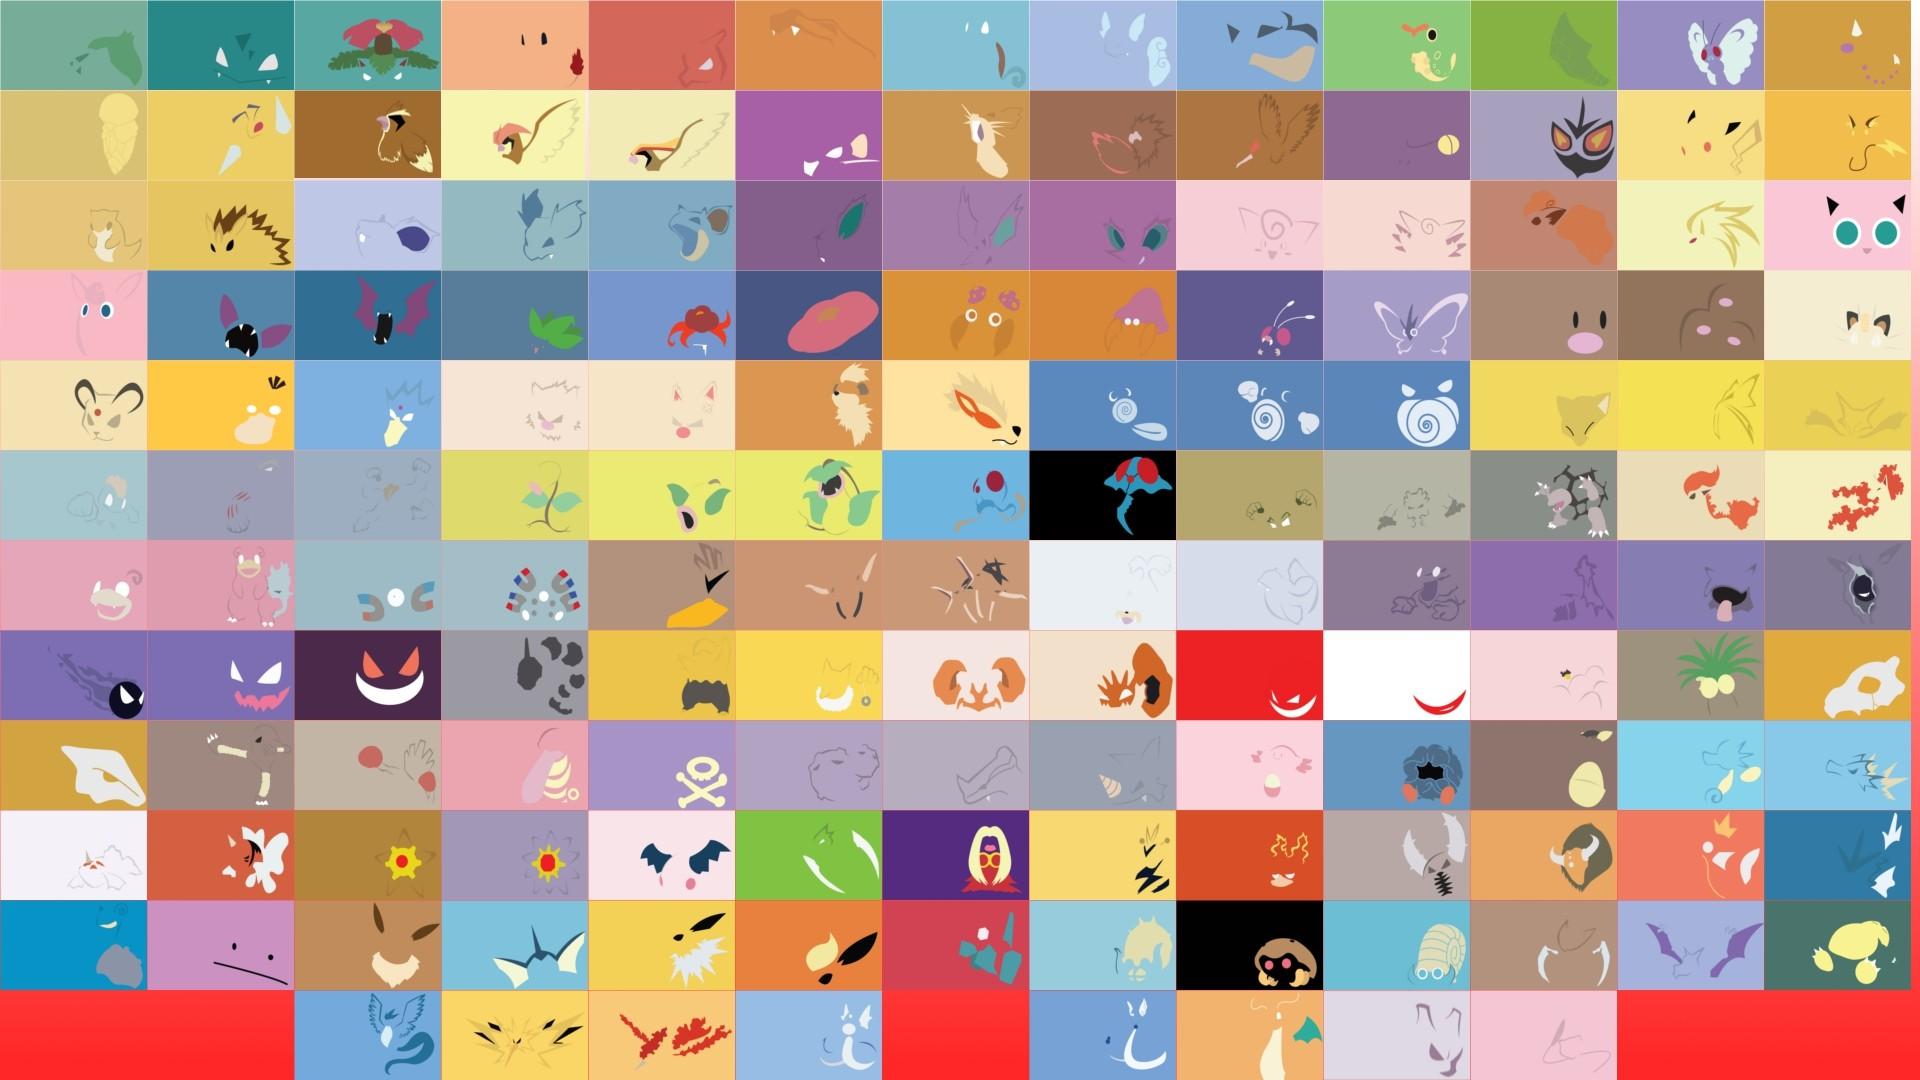 Pokemon Wallpaper Backgrounds #9249 Wallpaper   Cool Walldiskpaper.com